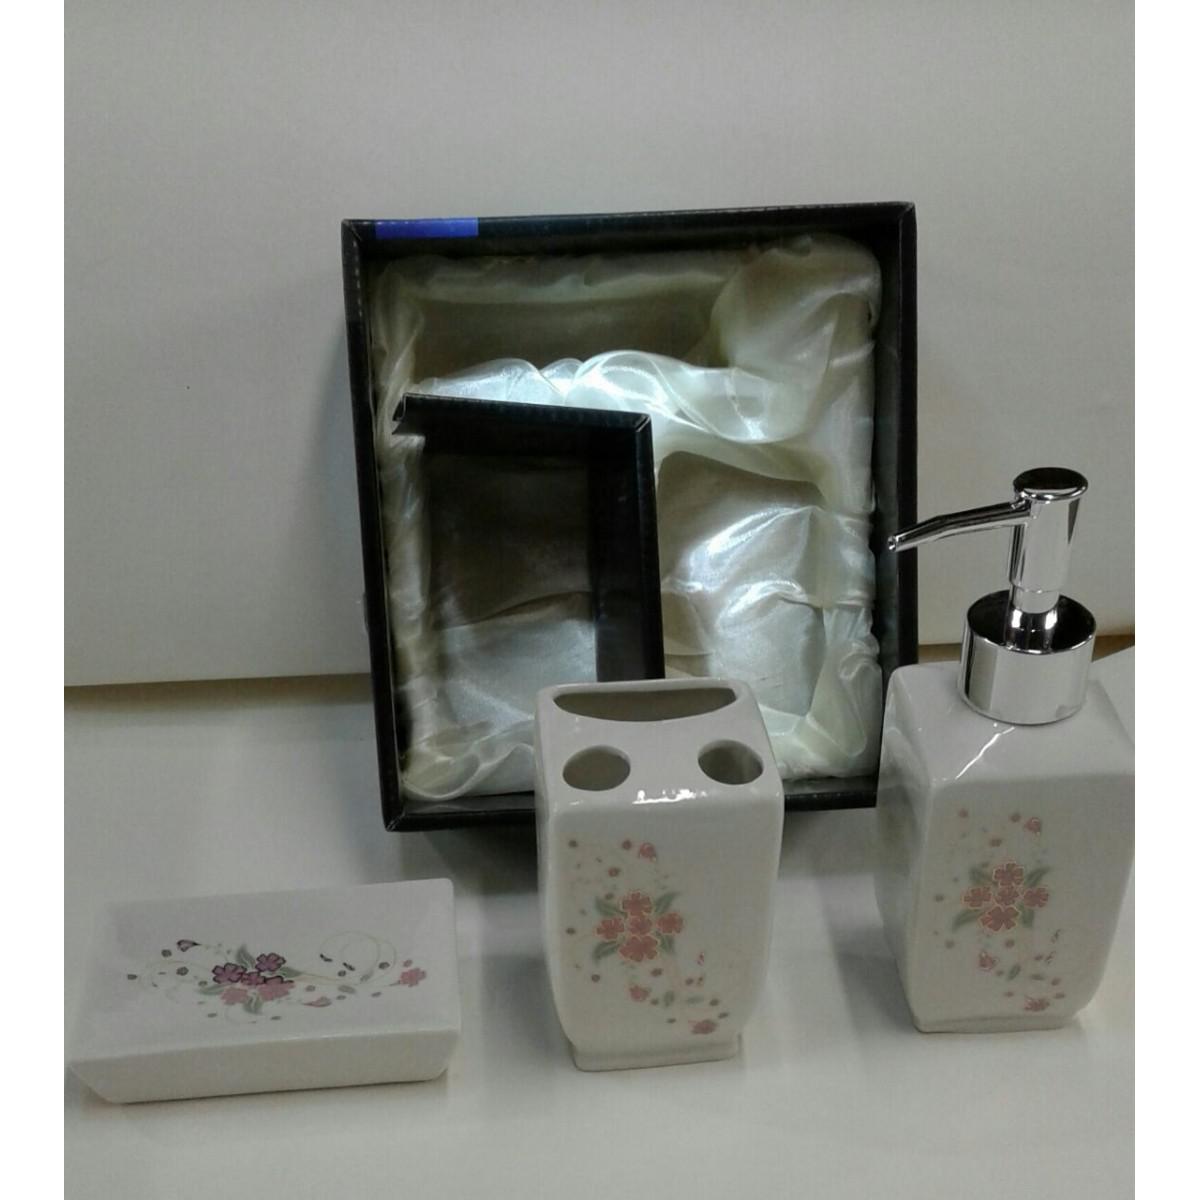 Kit Banheiro Porcelana Mickey : Kit de banheiro floral porcelana wincy casa banho